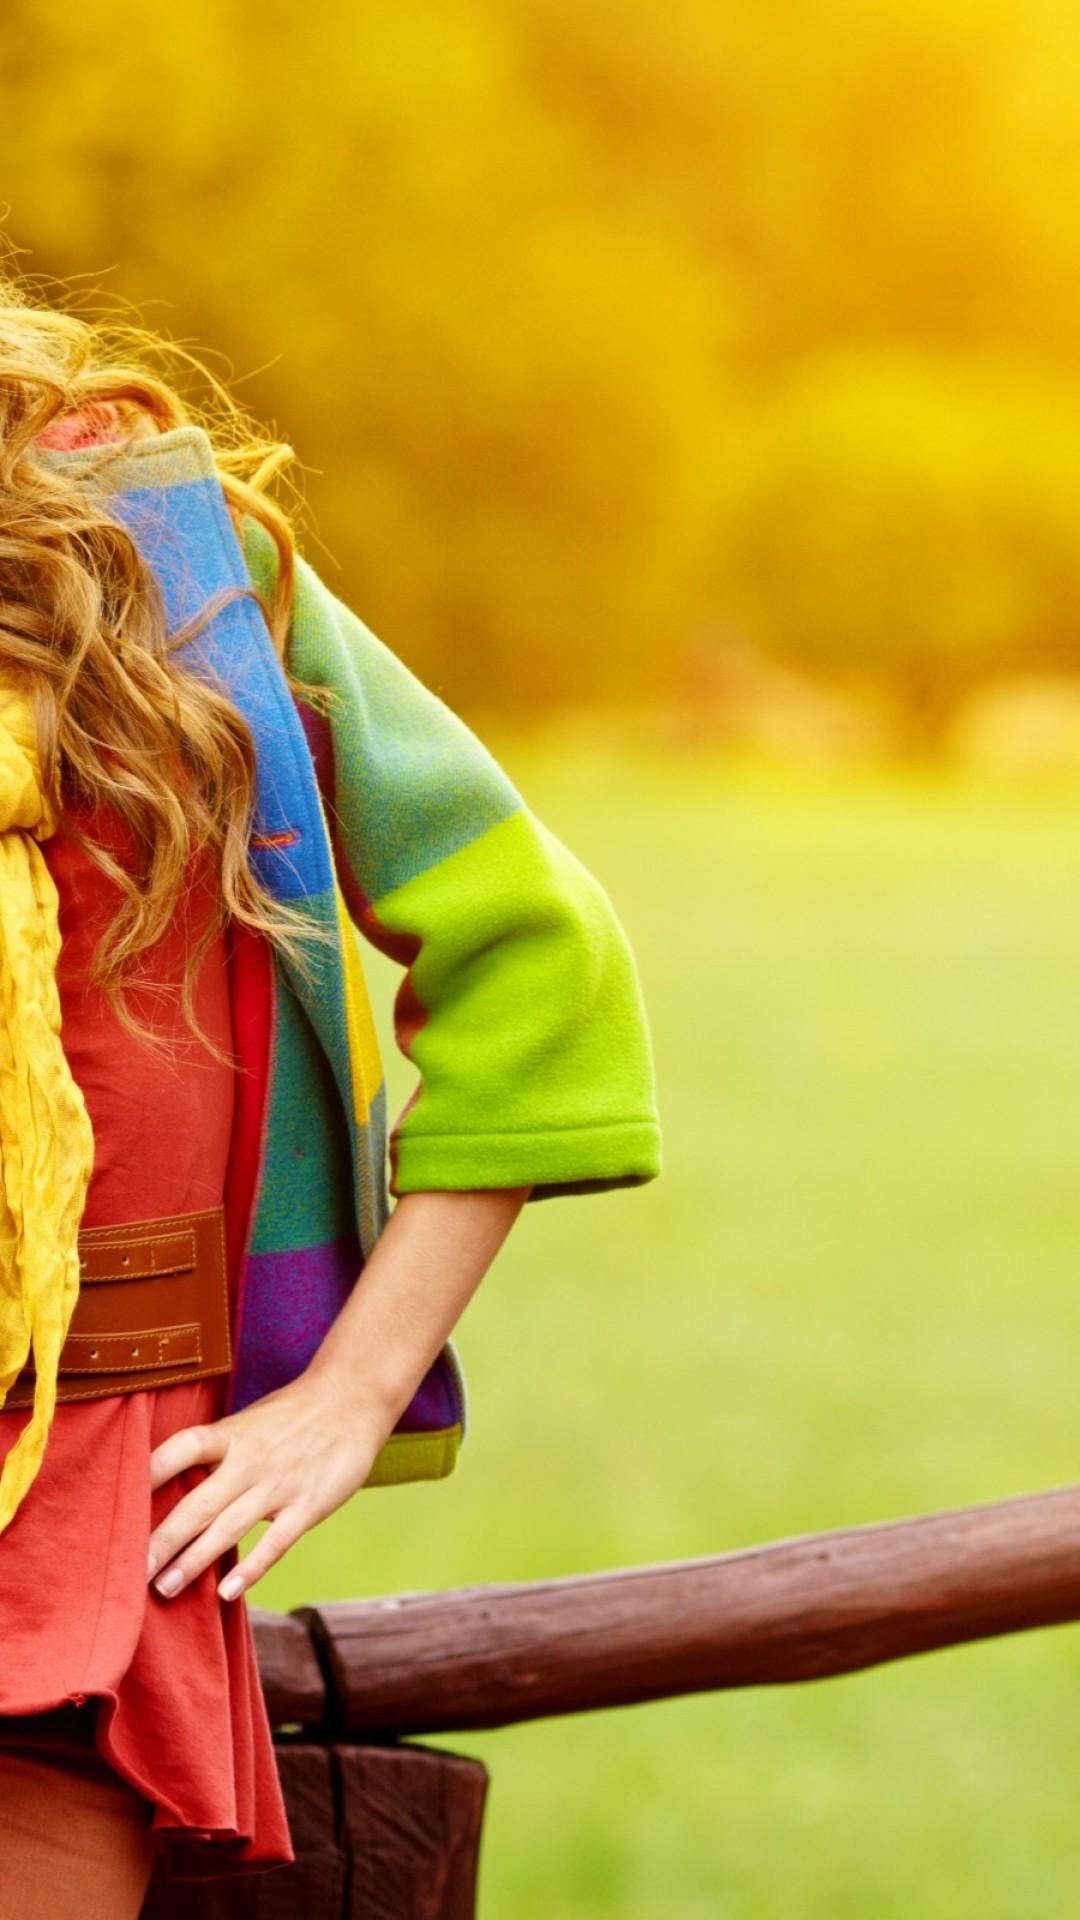 Woman Autumn Fashion Hd Wallpaper Iphone 6 6s Plus Hd